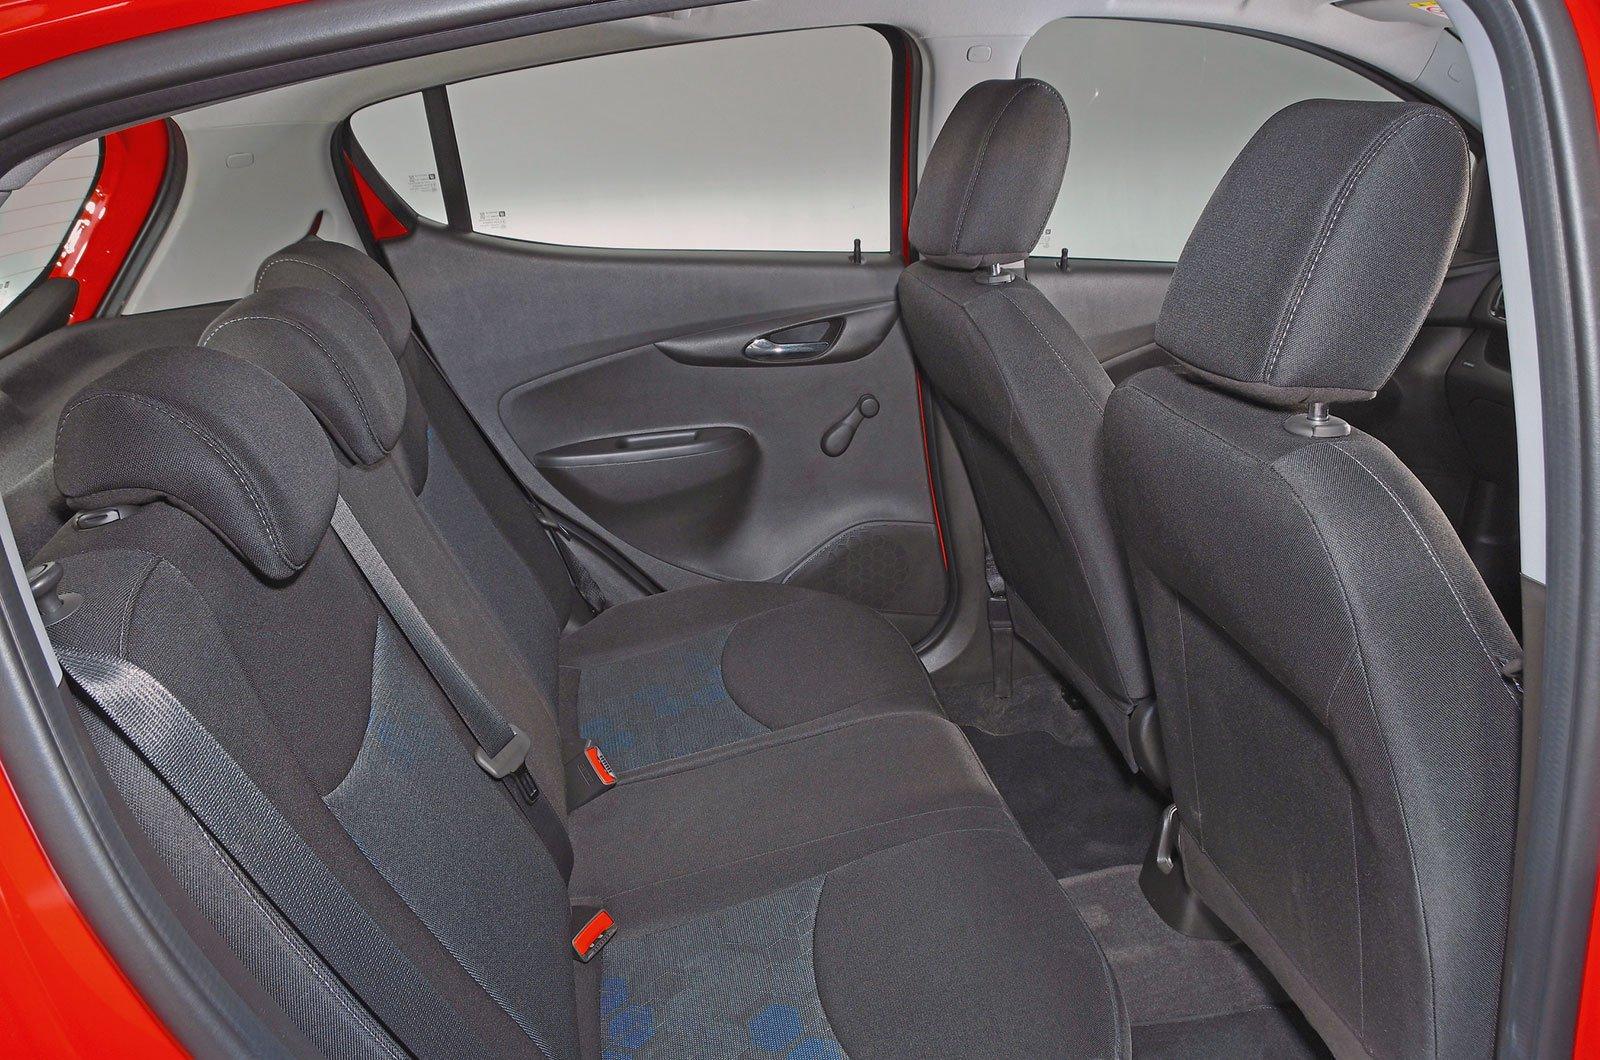 Vauxhall Viva rear seats